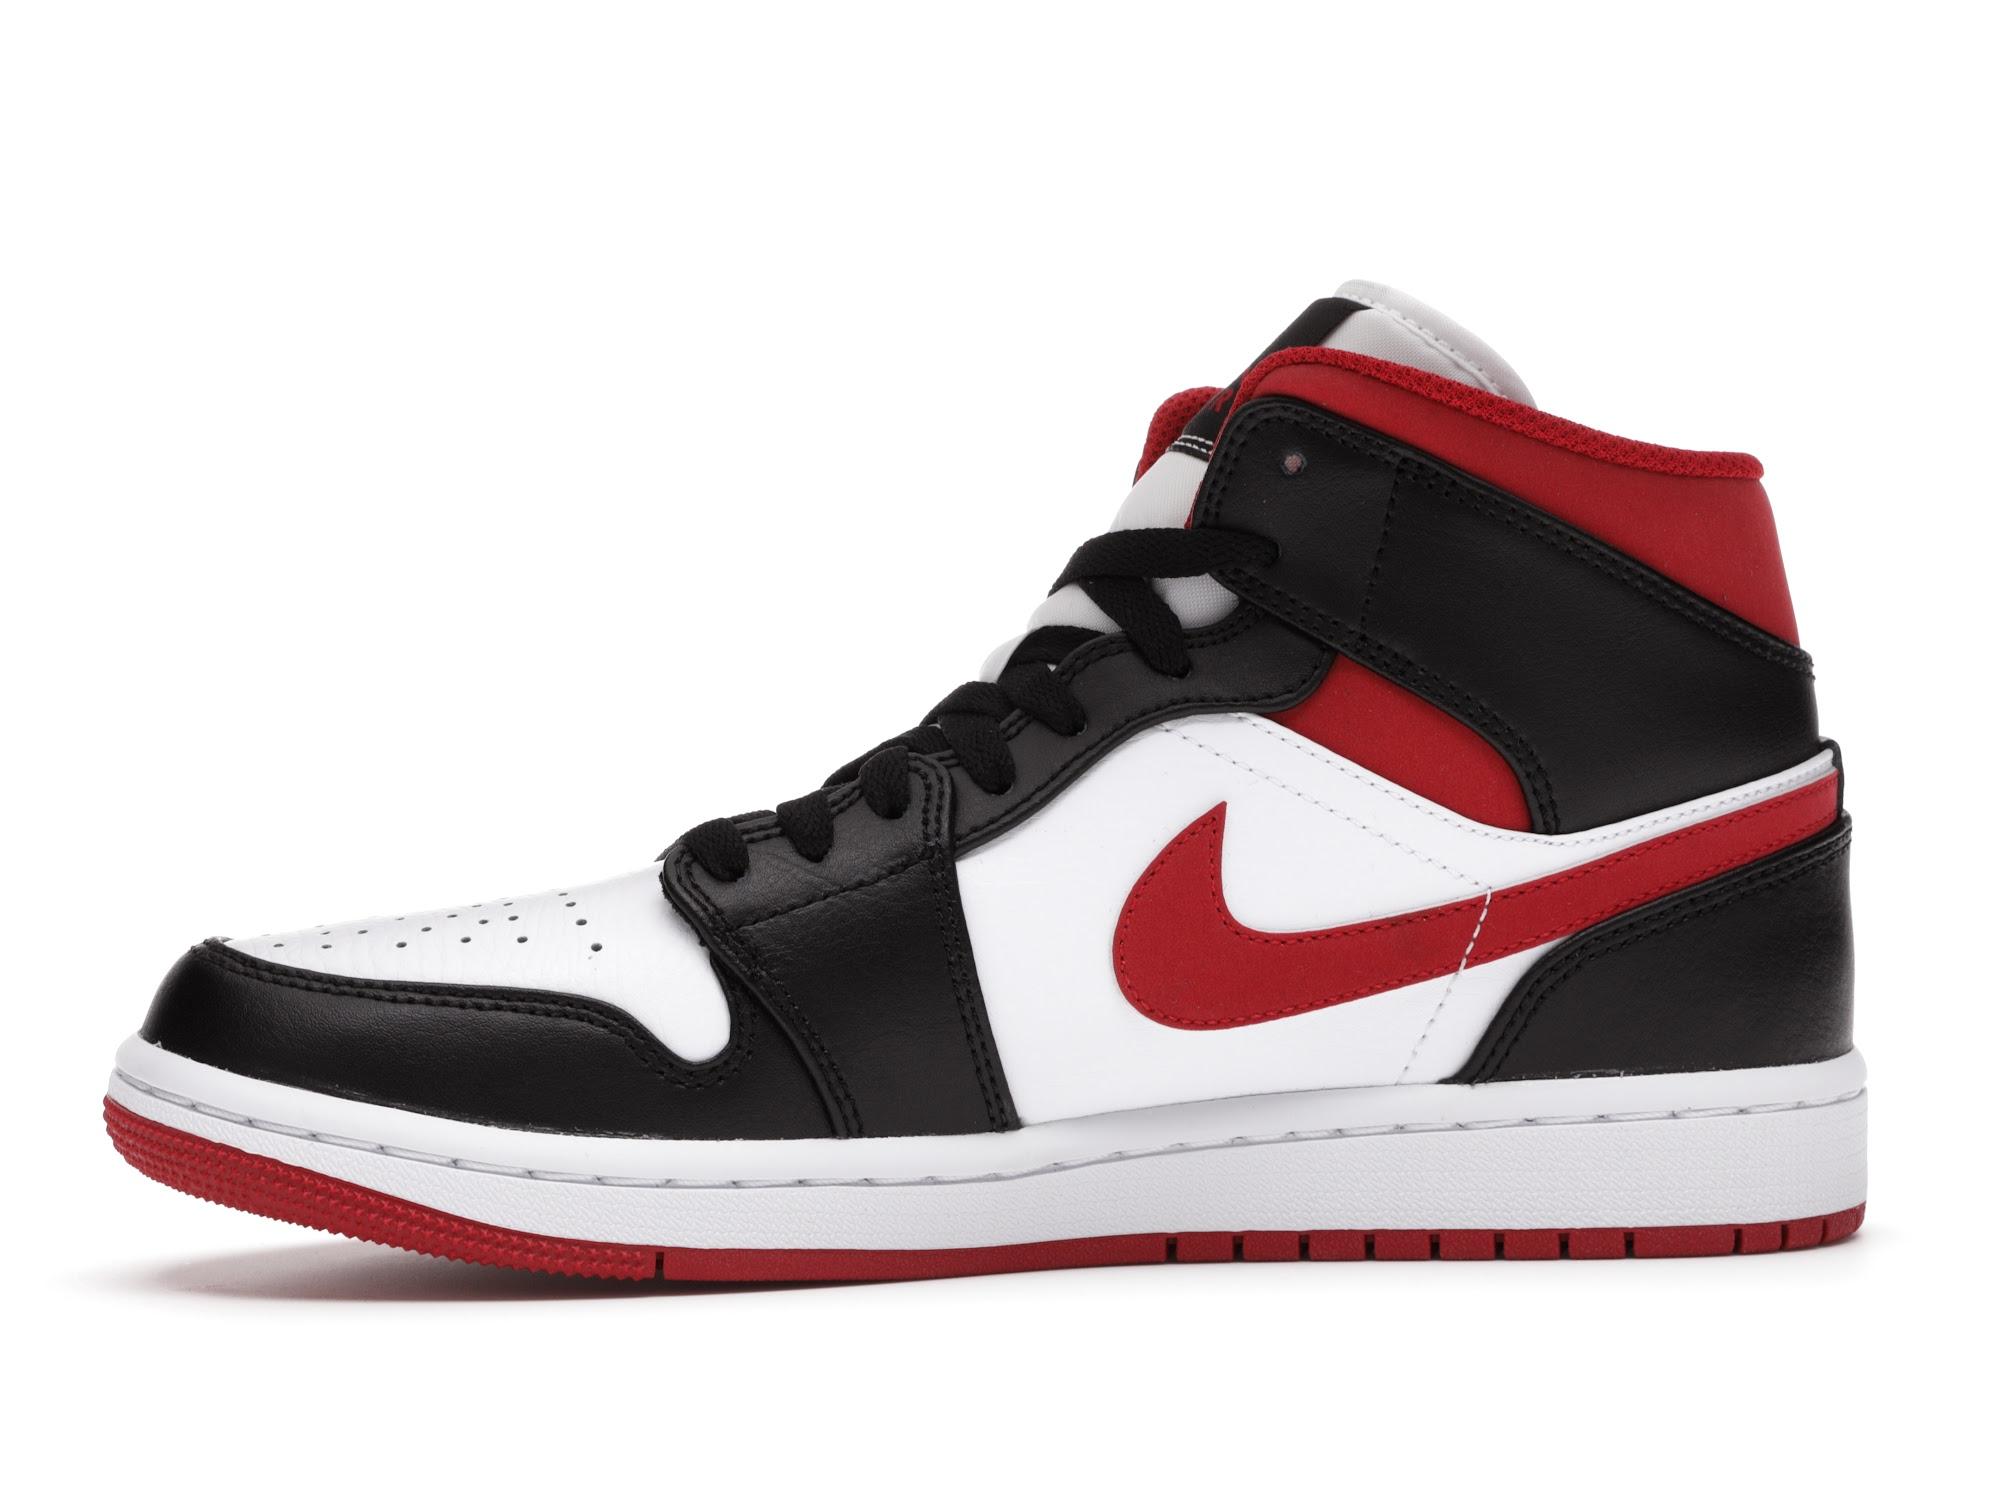 Jordan 1 Mid Gym Red Black White - 554724-122